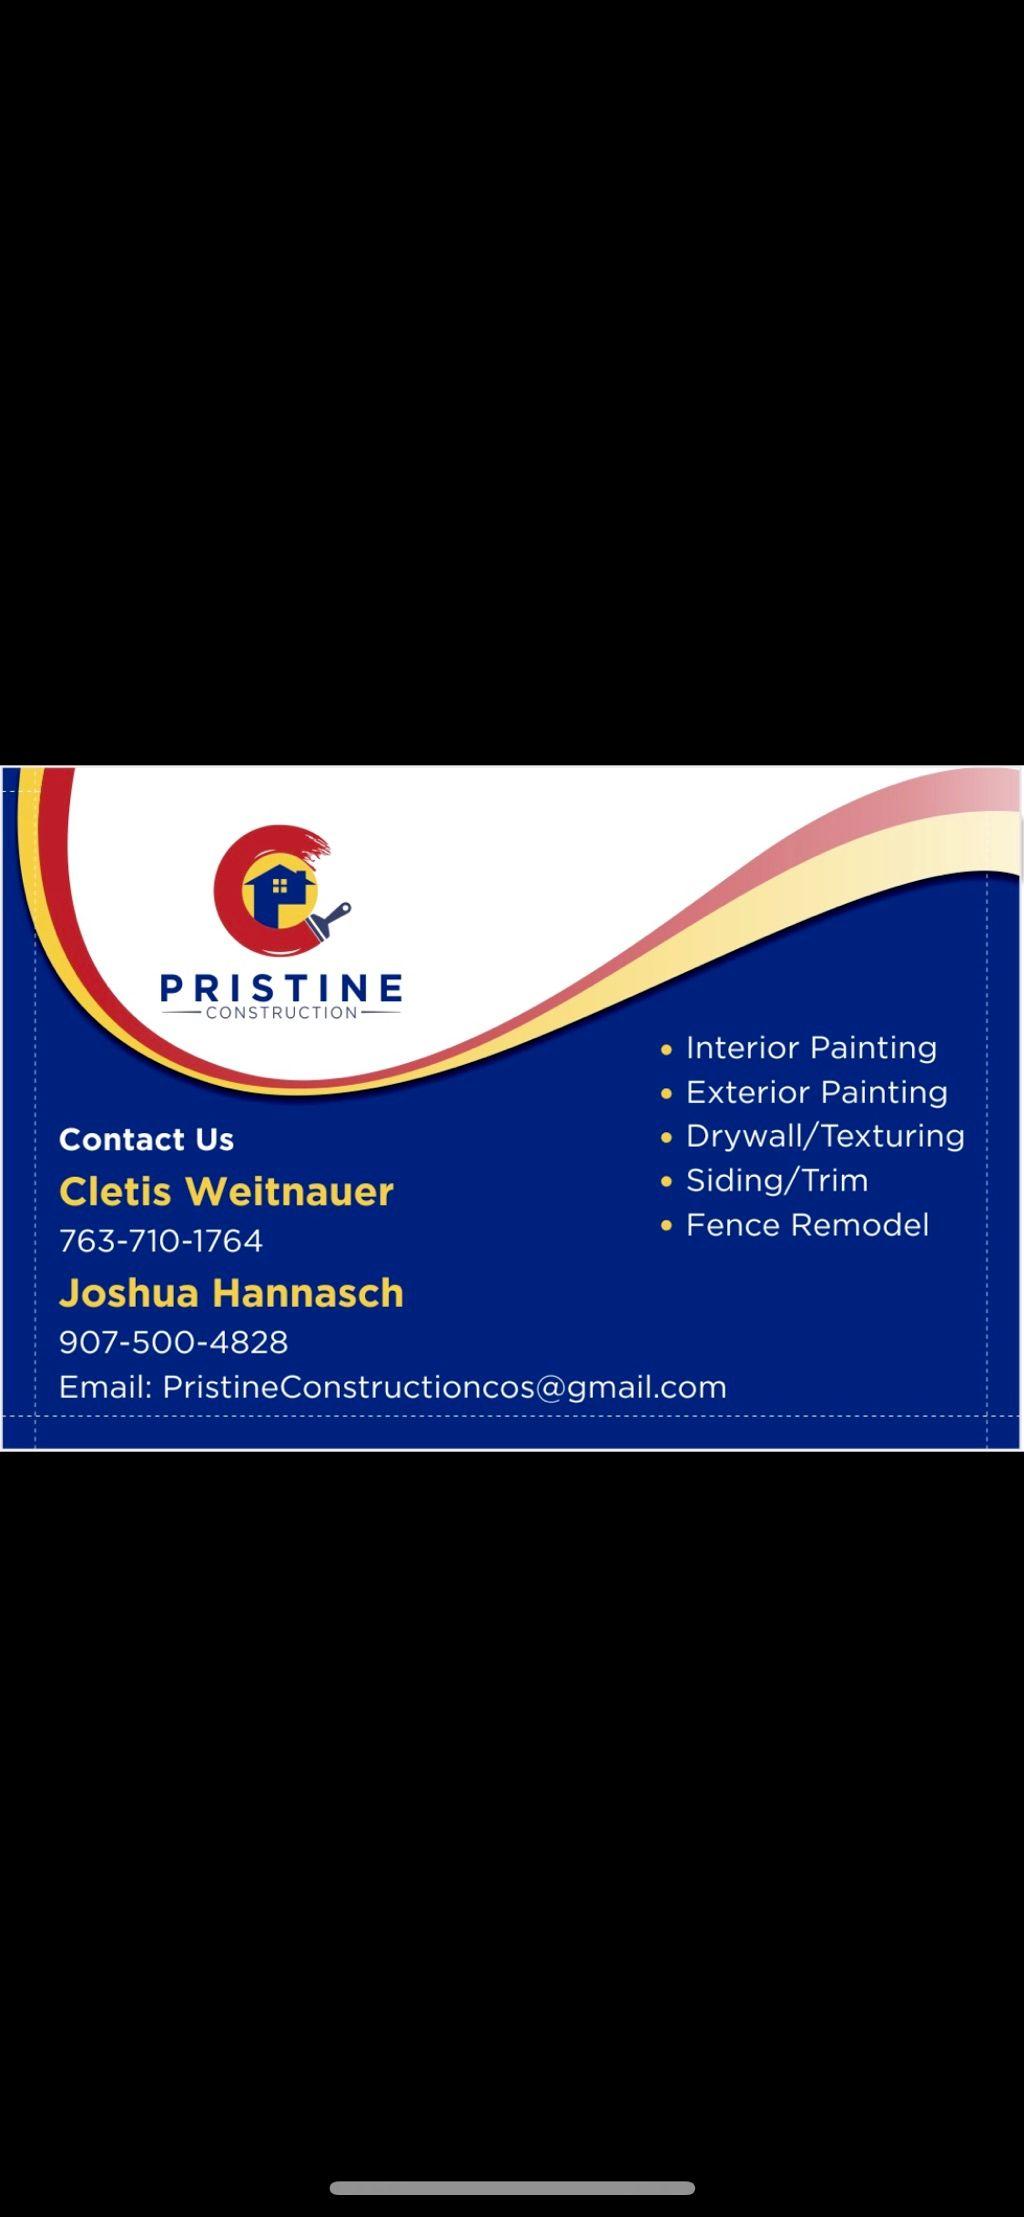 Pristine Construction, Inc.